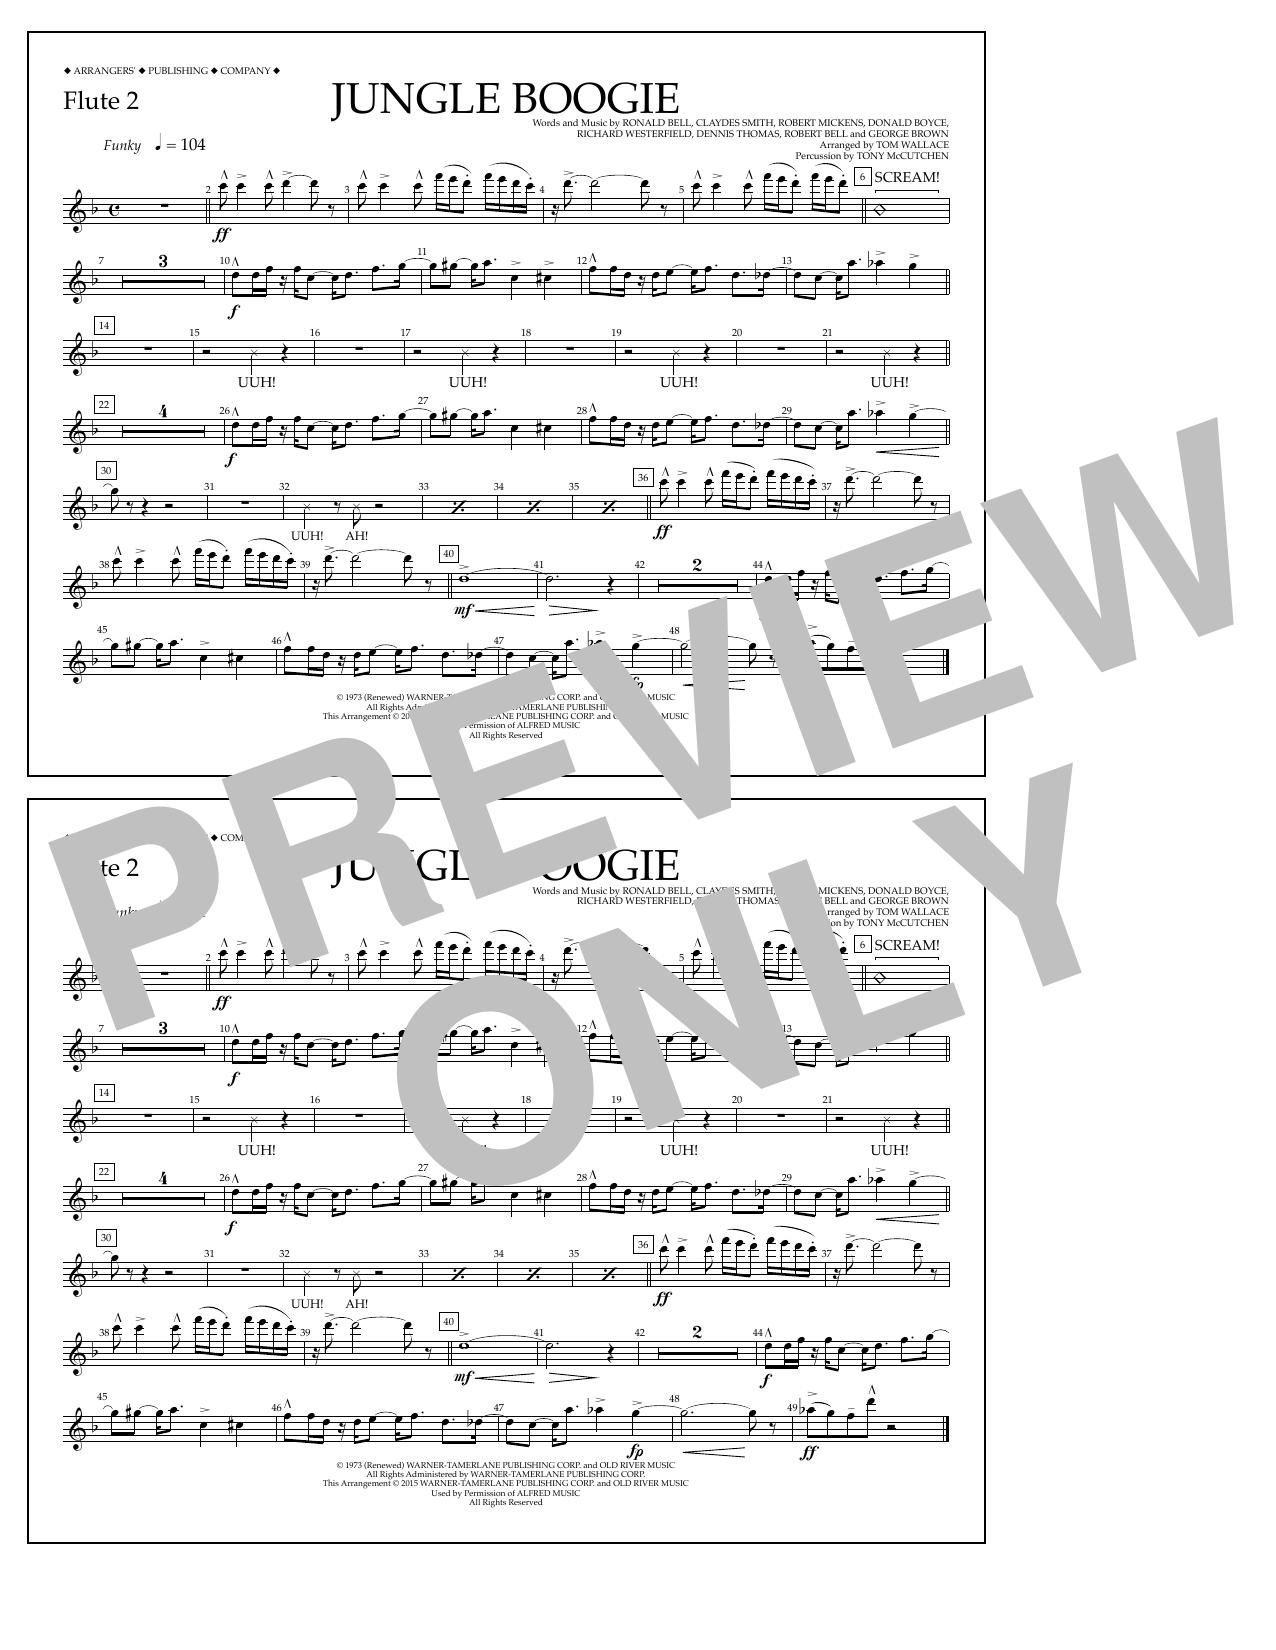 Kool & The Gang - Jungle Boogie - Flute 2